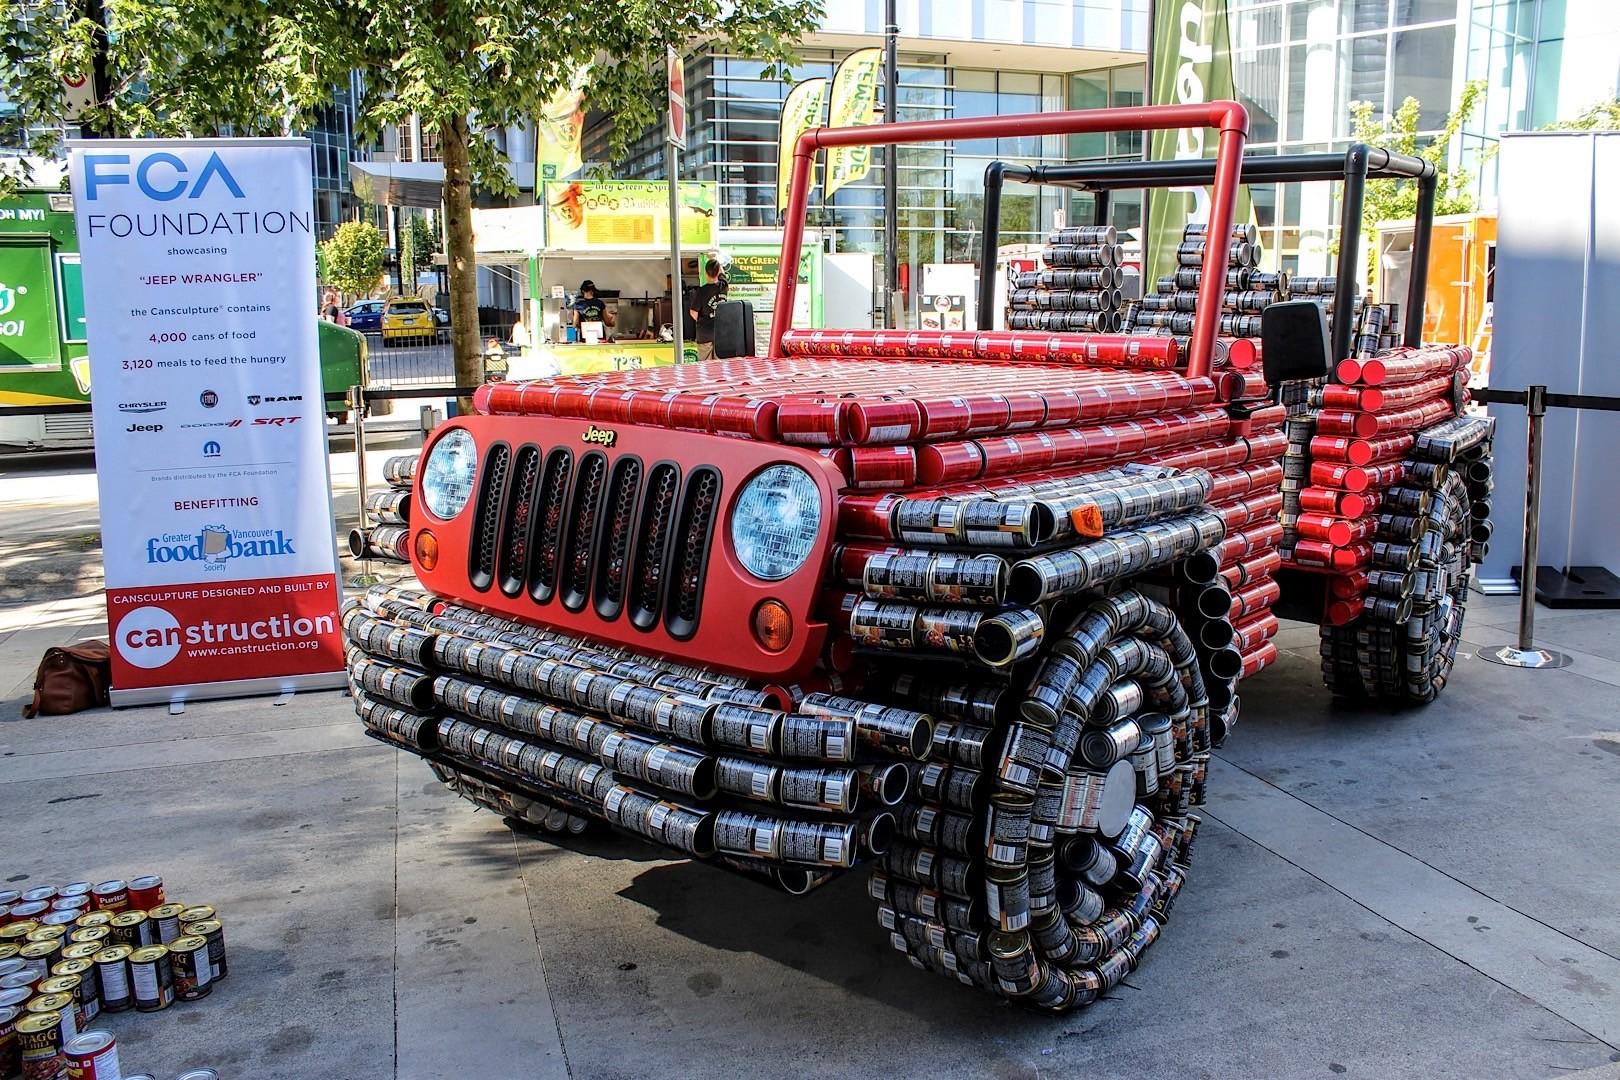 food cans made jeep wrangler looks like tin man 39 s ride we applaud the idea autoevolution. Black Bedroom Furniture Sets. Home Design Ideas